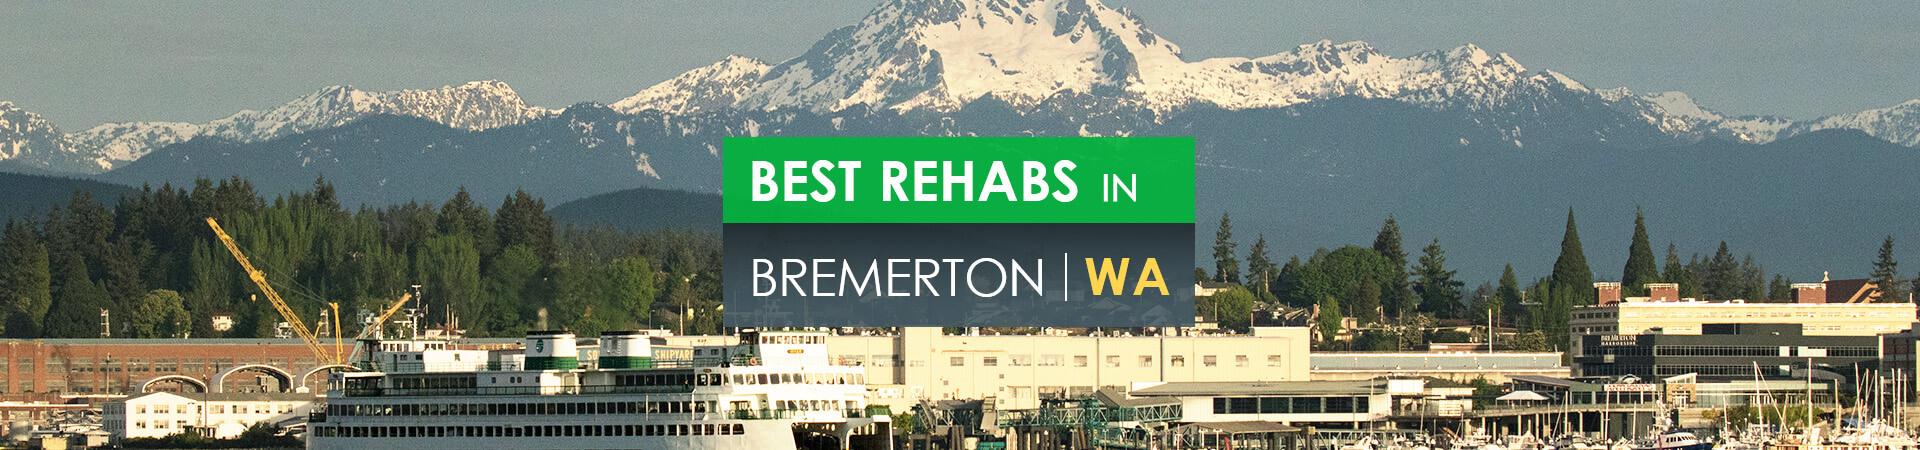 Best rehabs in Bremerton, WA